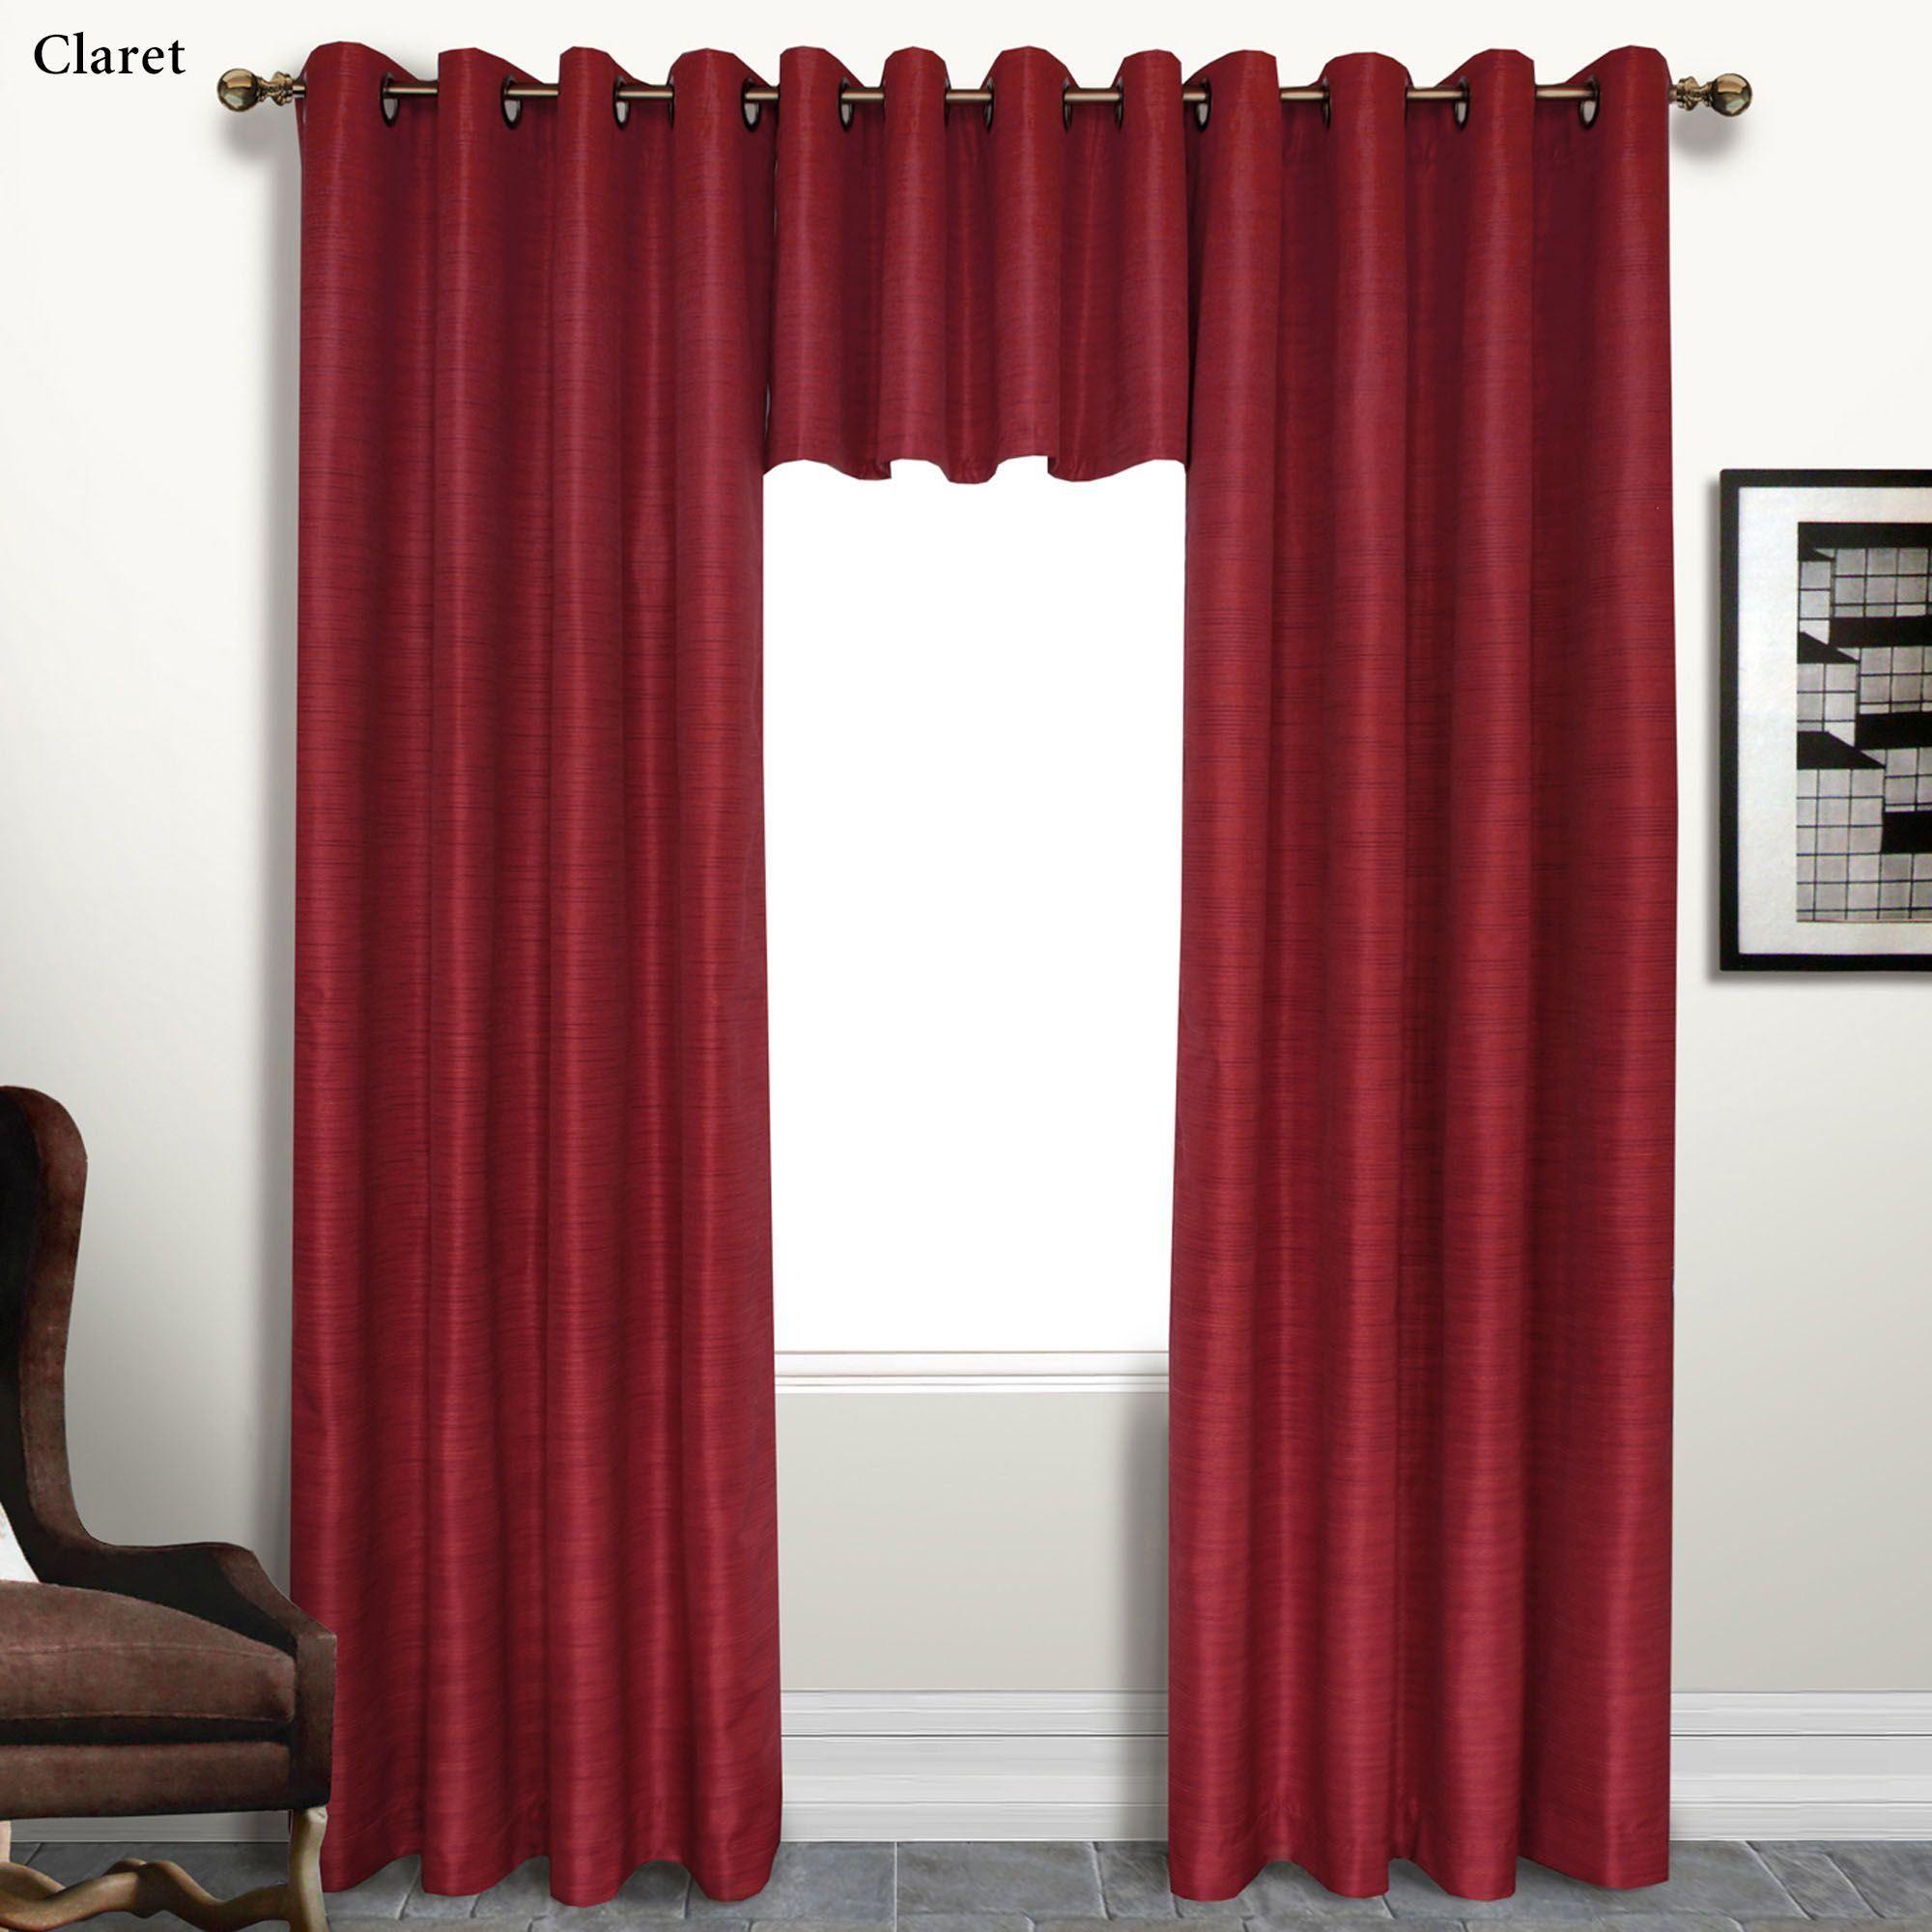 curtains denim inspiring bridal ideas drapes shower blue